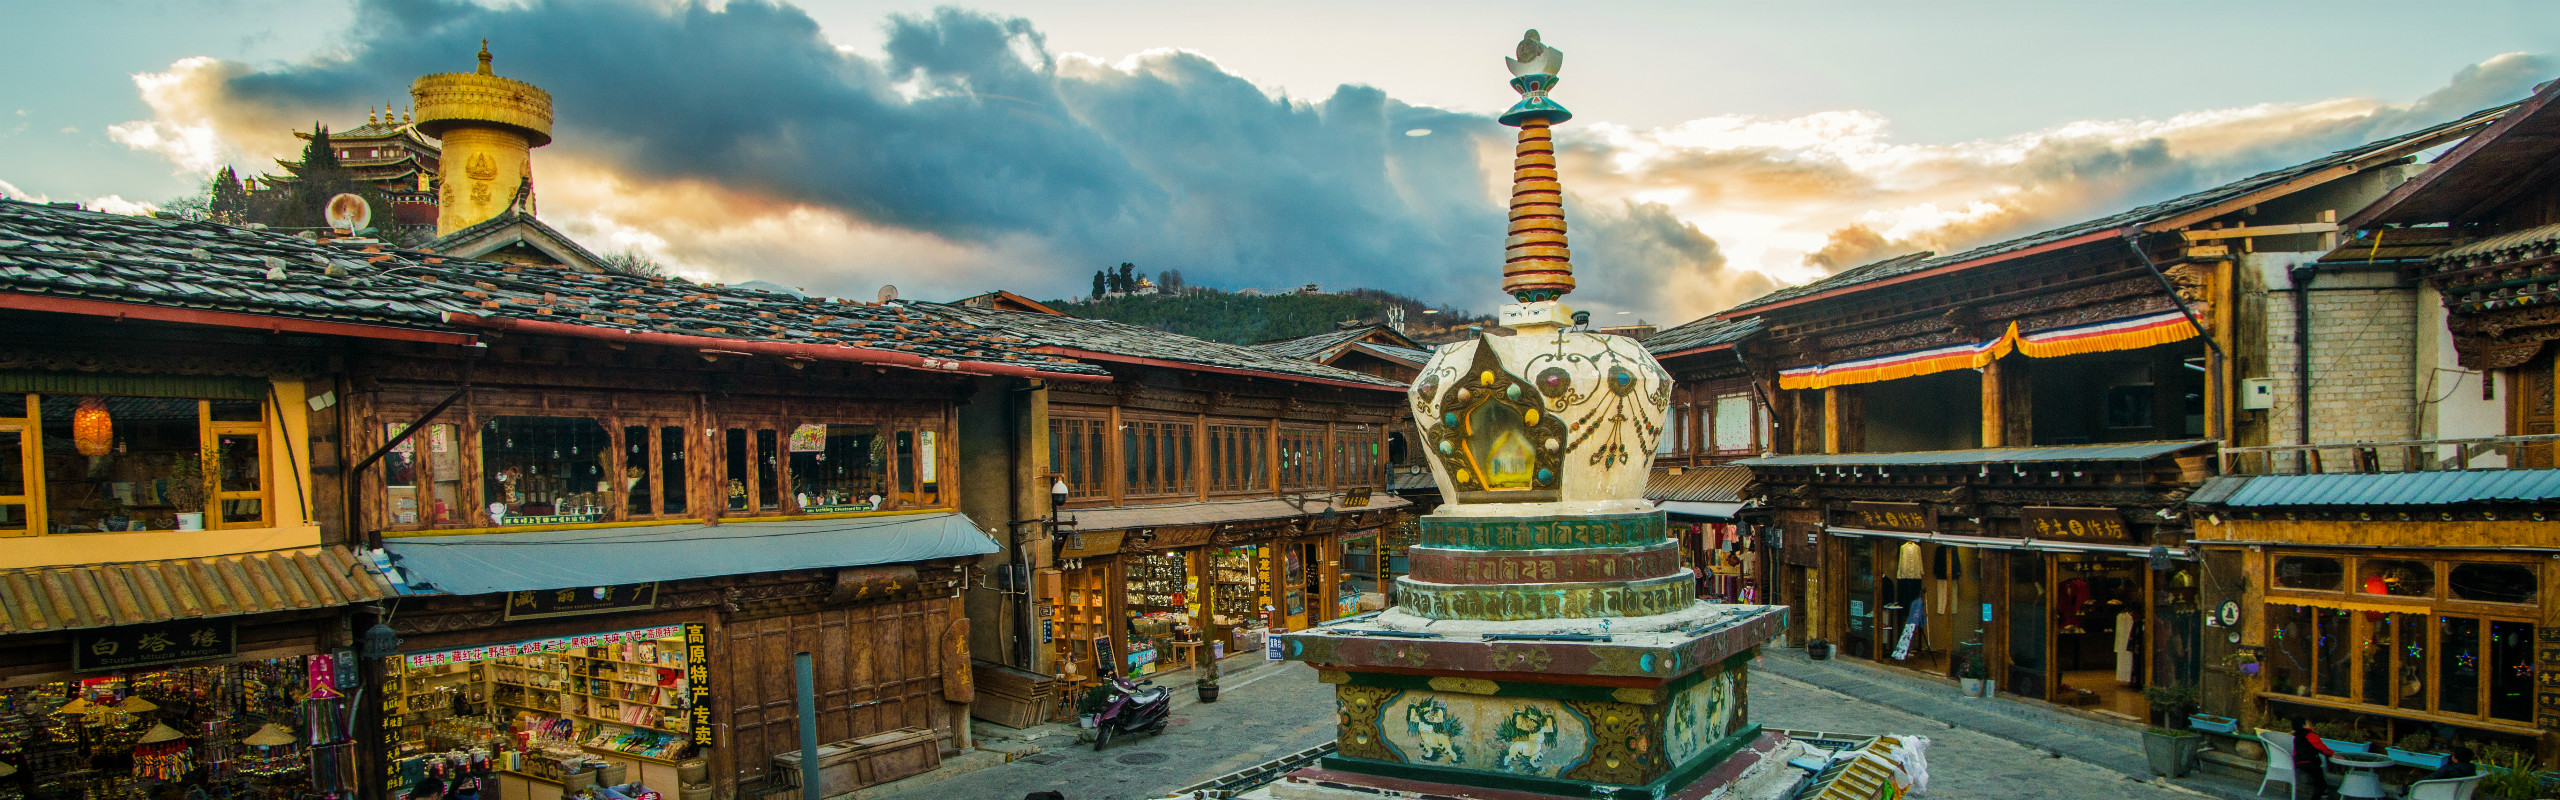 8-Day Chengdu to Shangri-La Adventure Tour